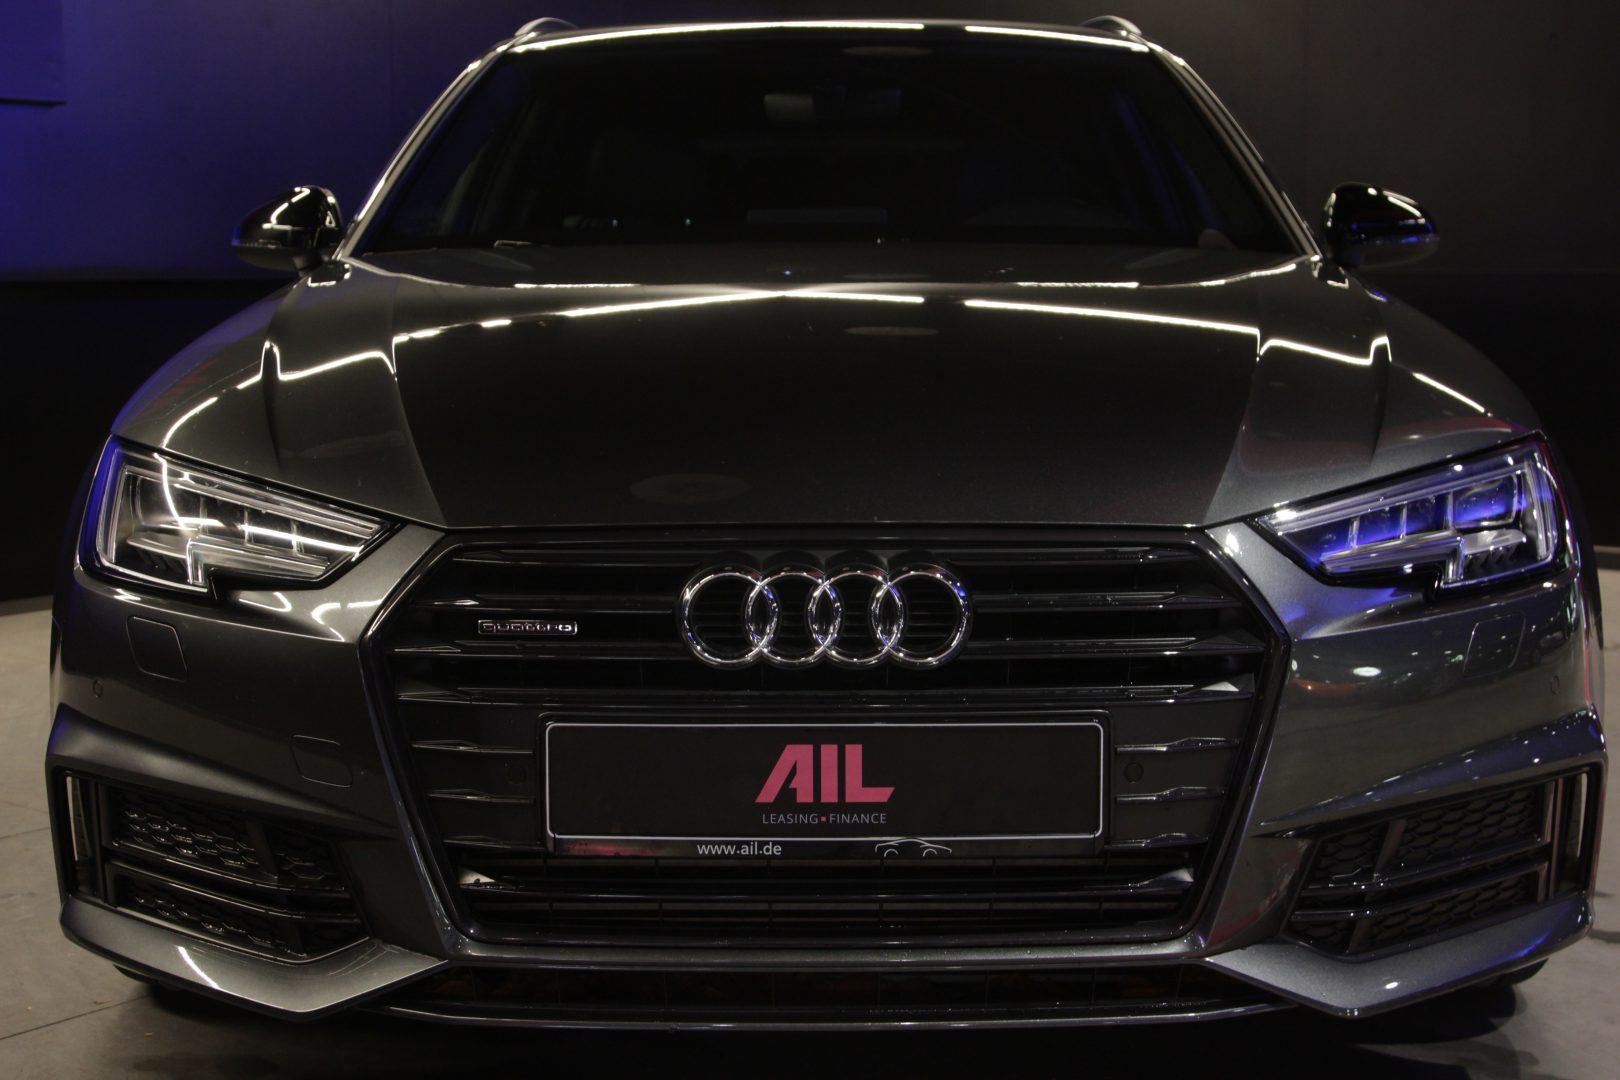 AIL Audi A4 Avant S line Sport / Plus quattro 3.0 TDI 1